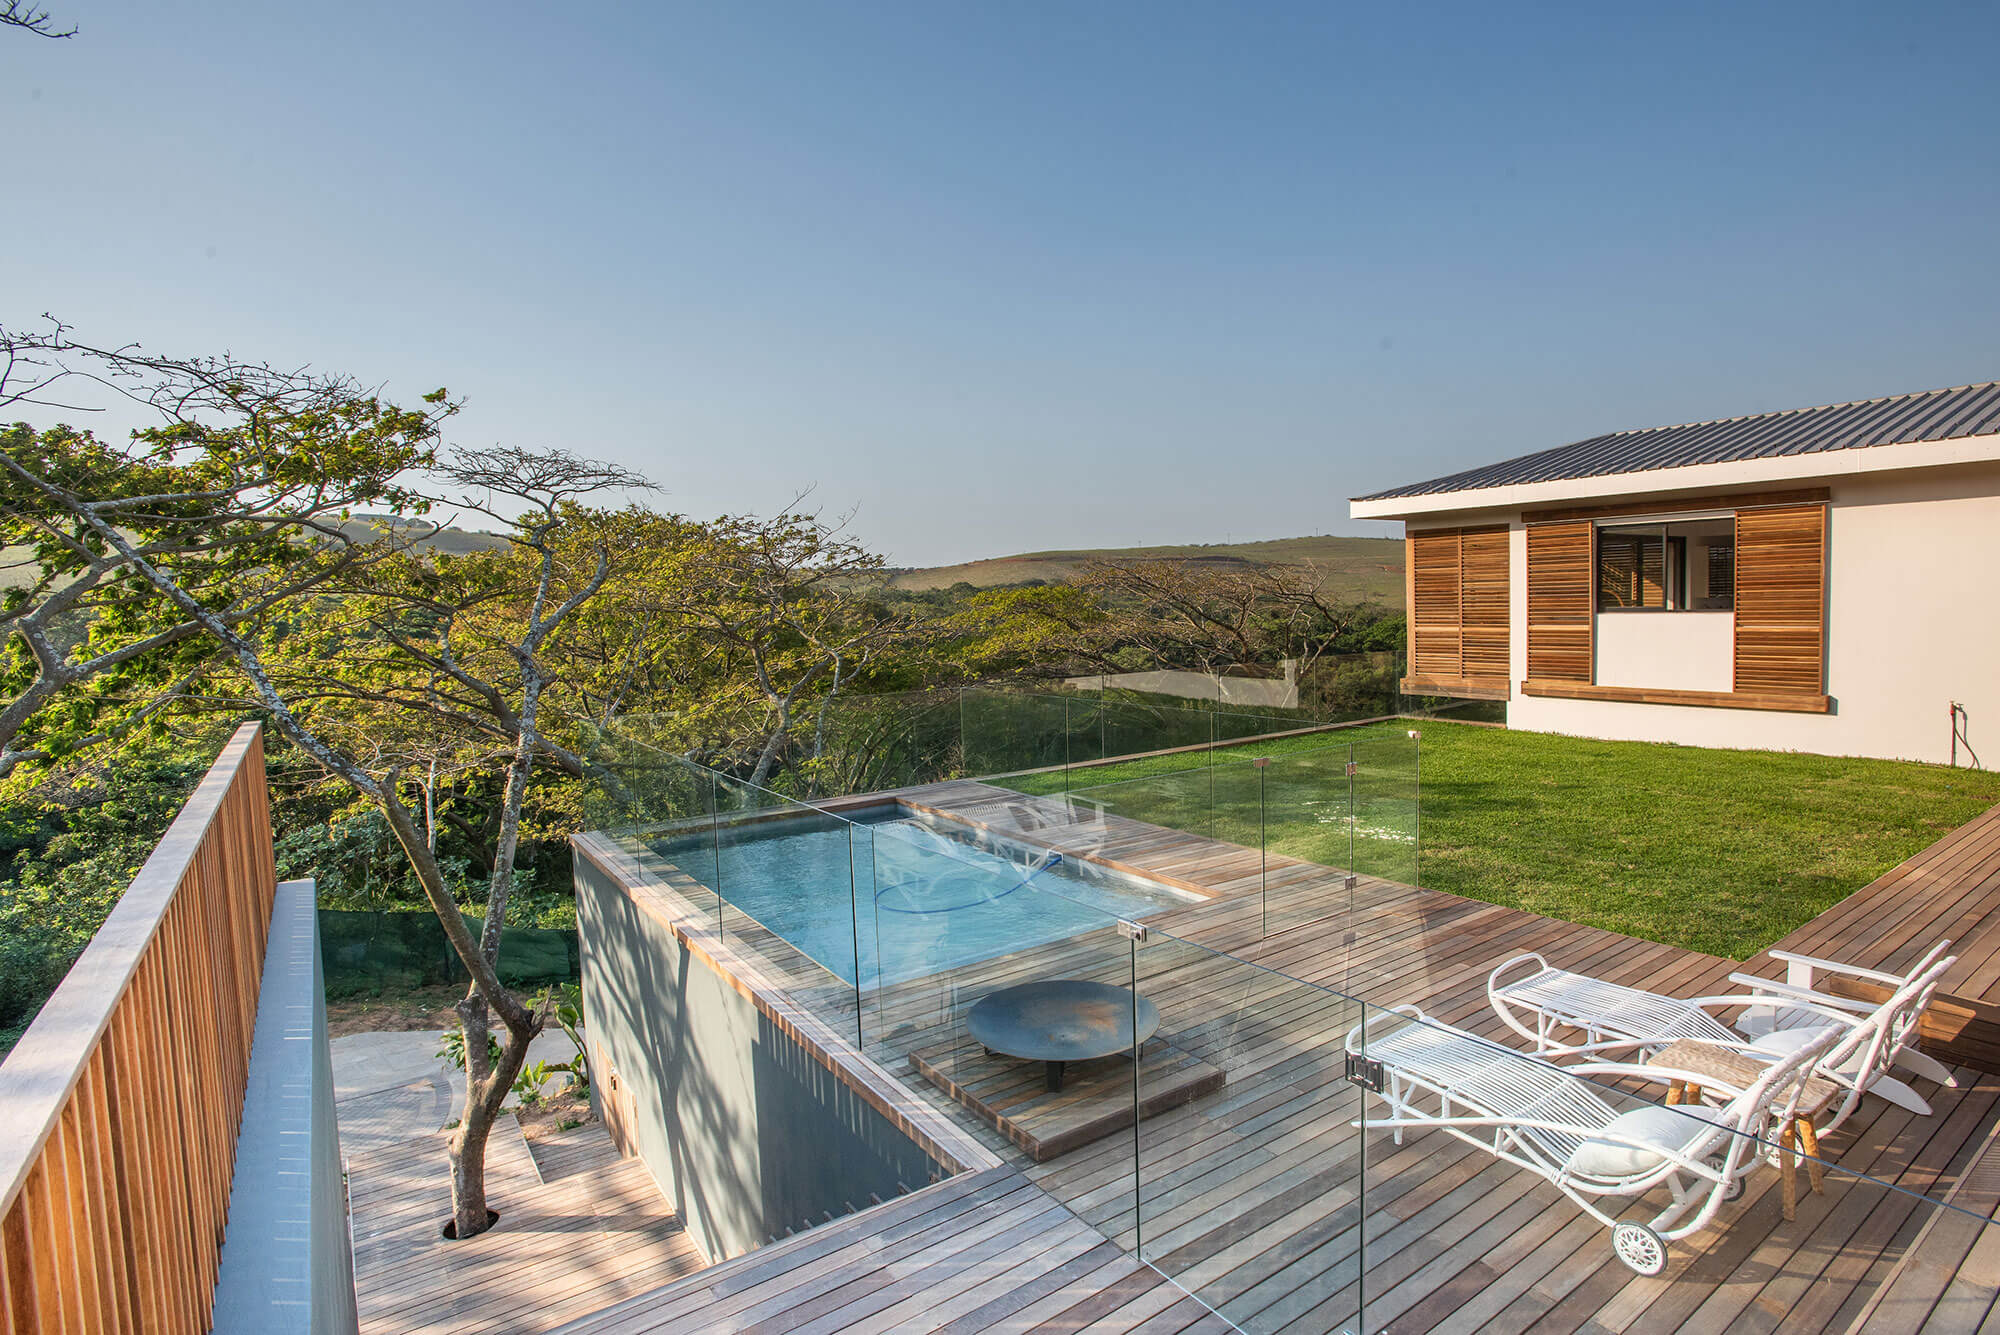 Elaleni 3 - Eco-friendly design and sustainability define modern lifestyle estates